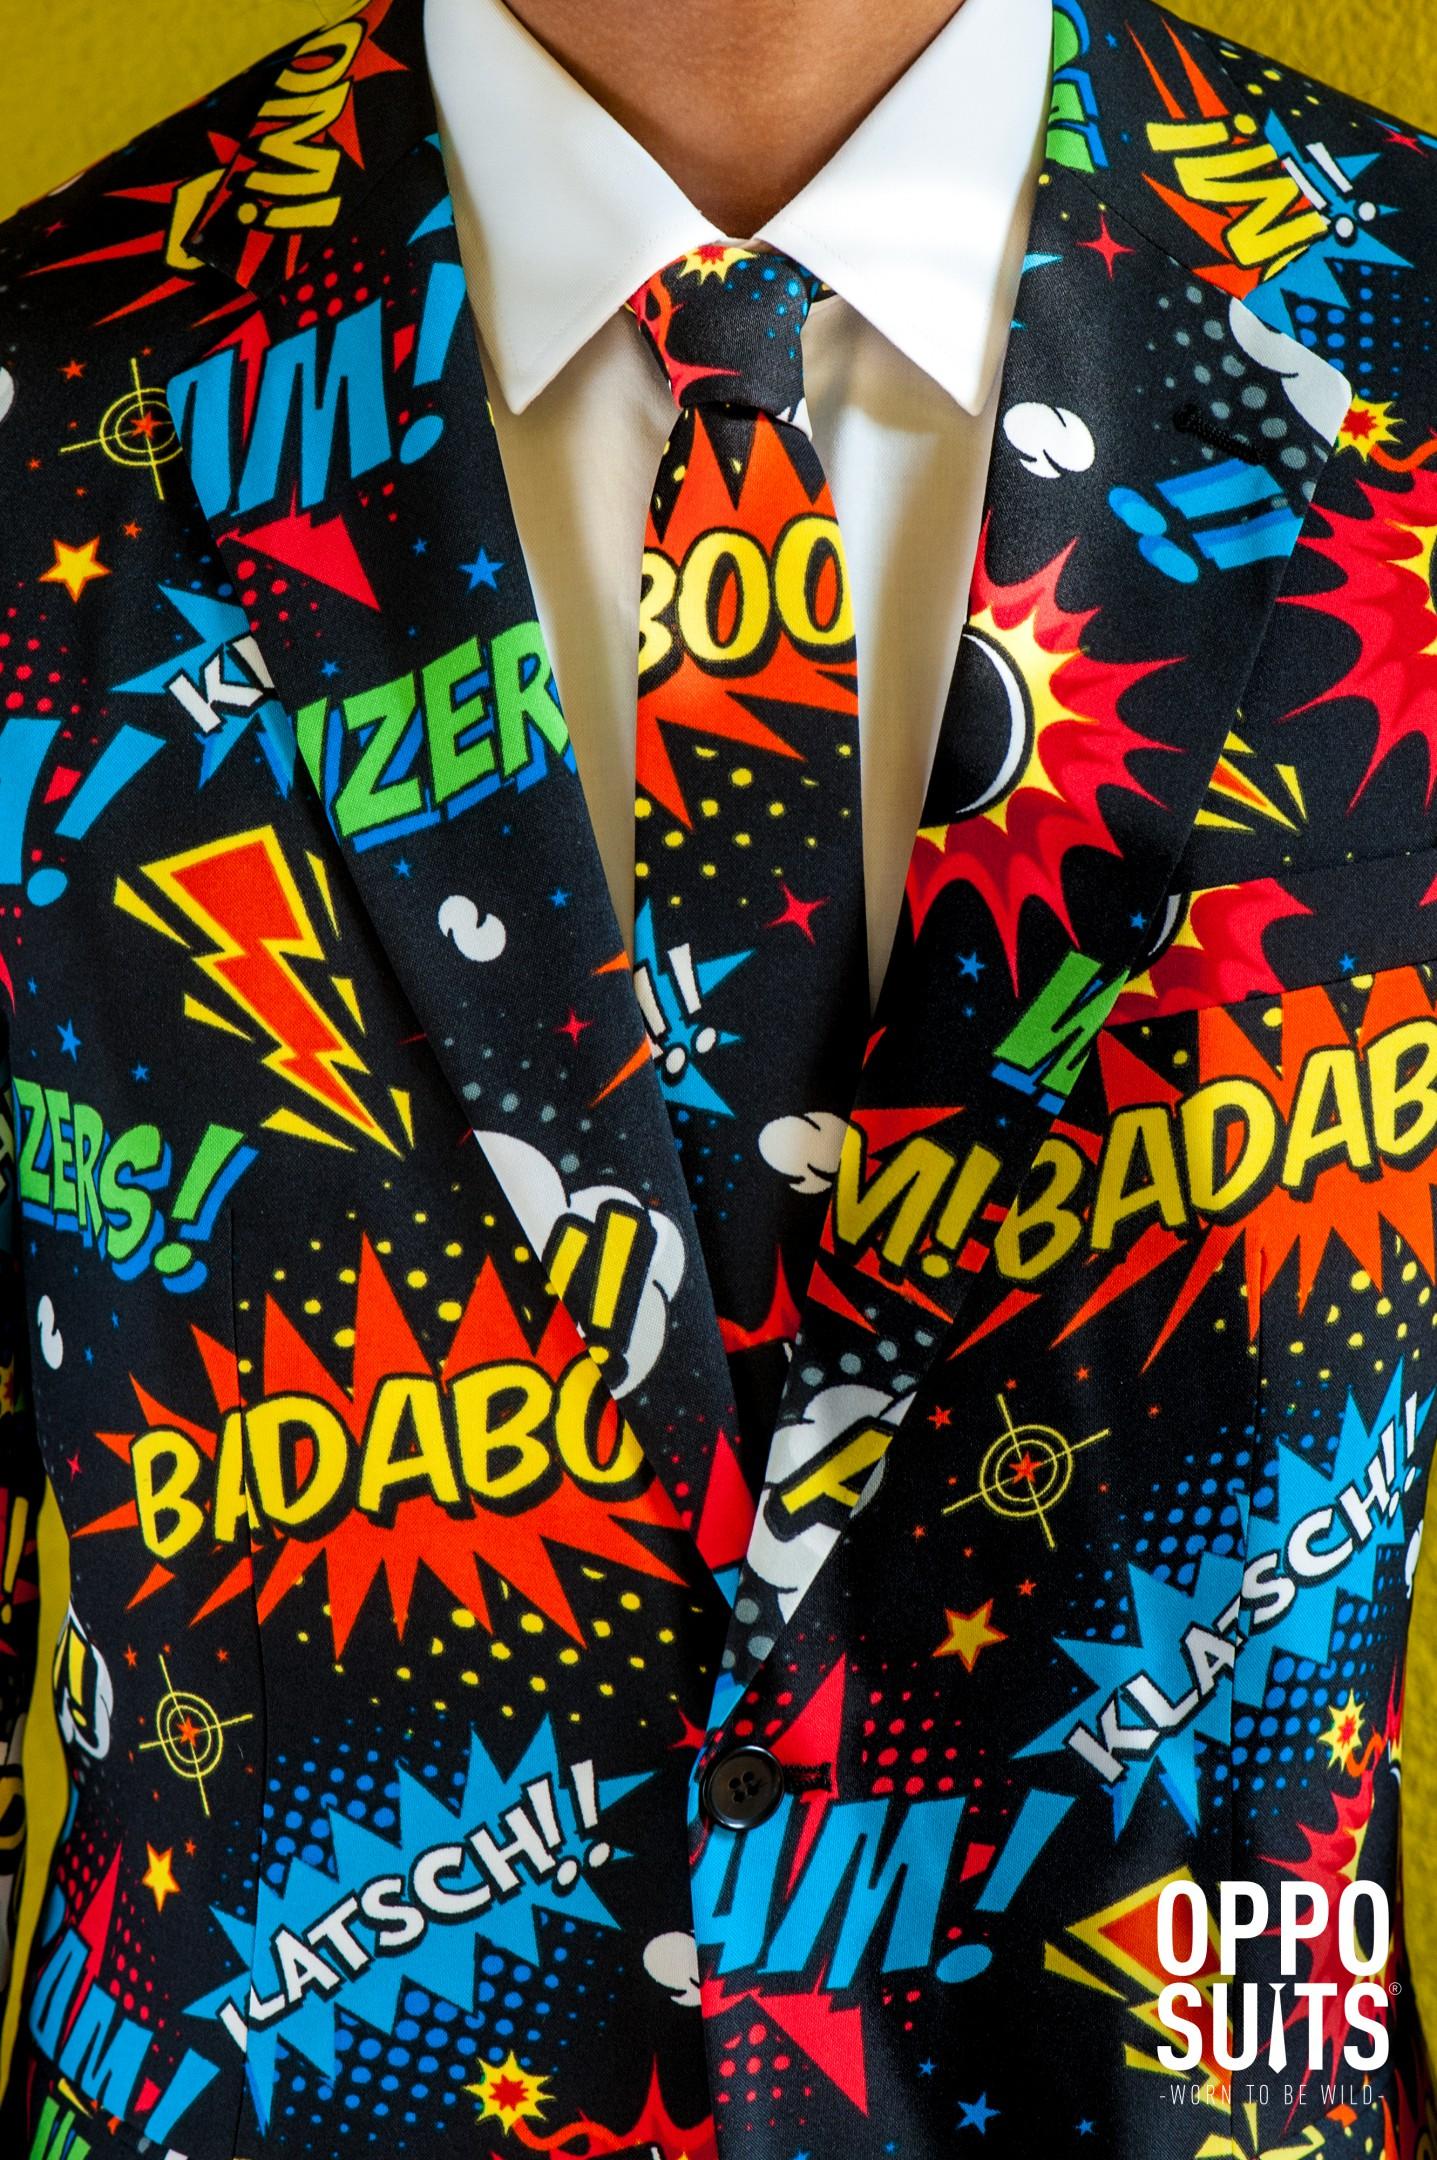 Badaboom-161360